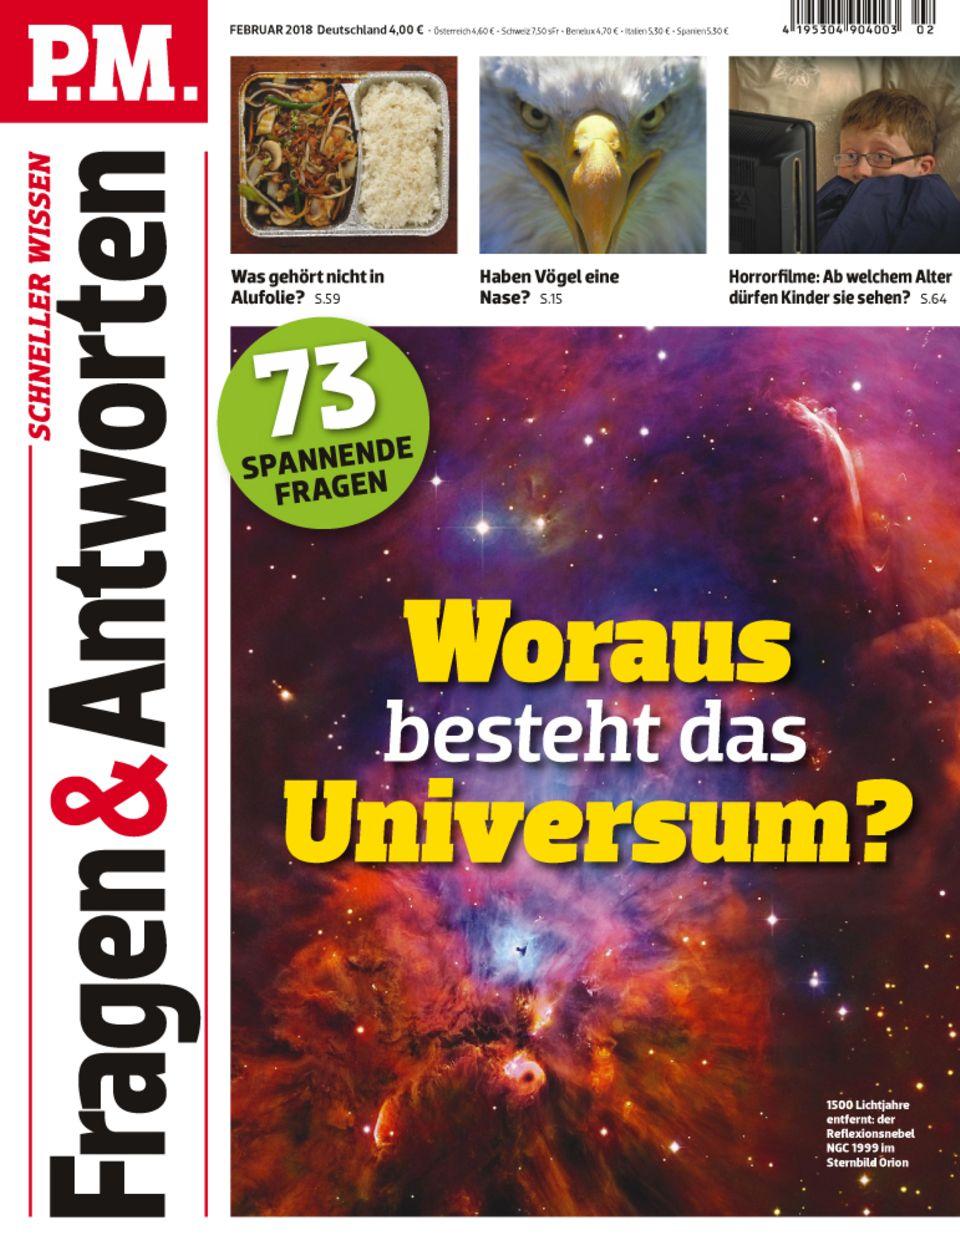 P.M. Fragen & Antworten Cover Februar 2018 Weltall Universum